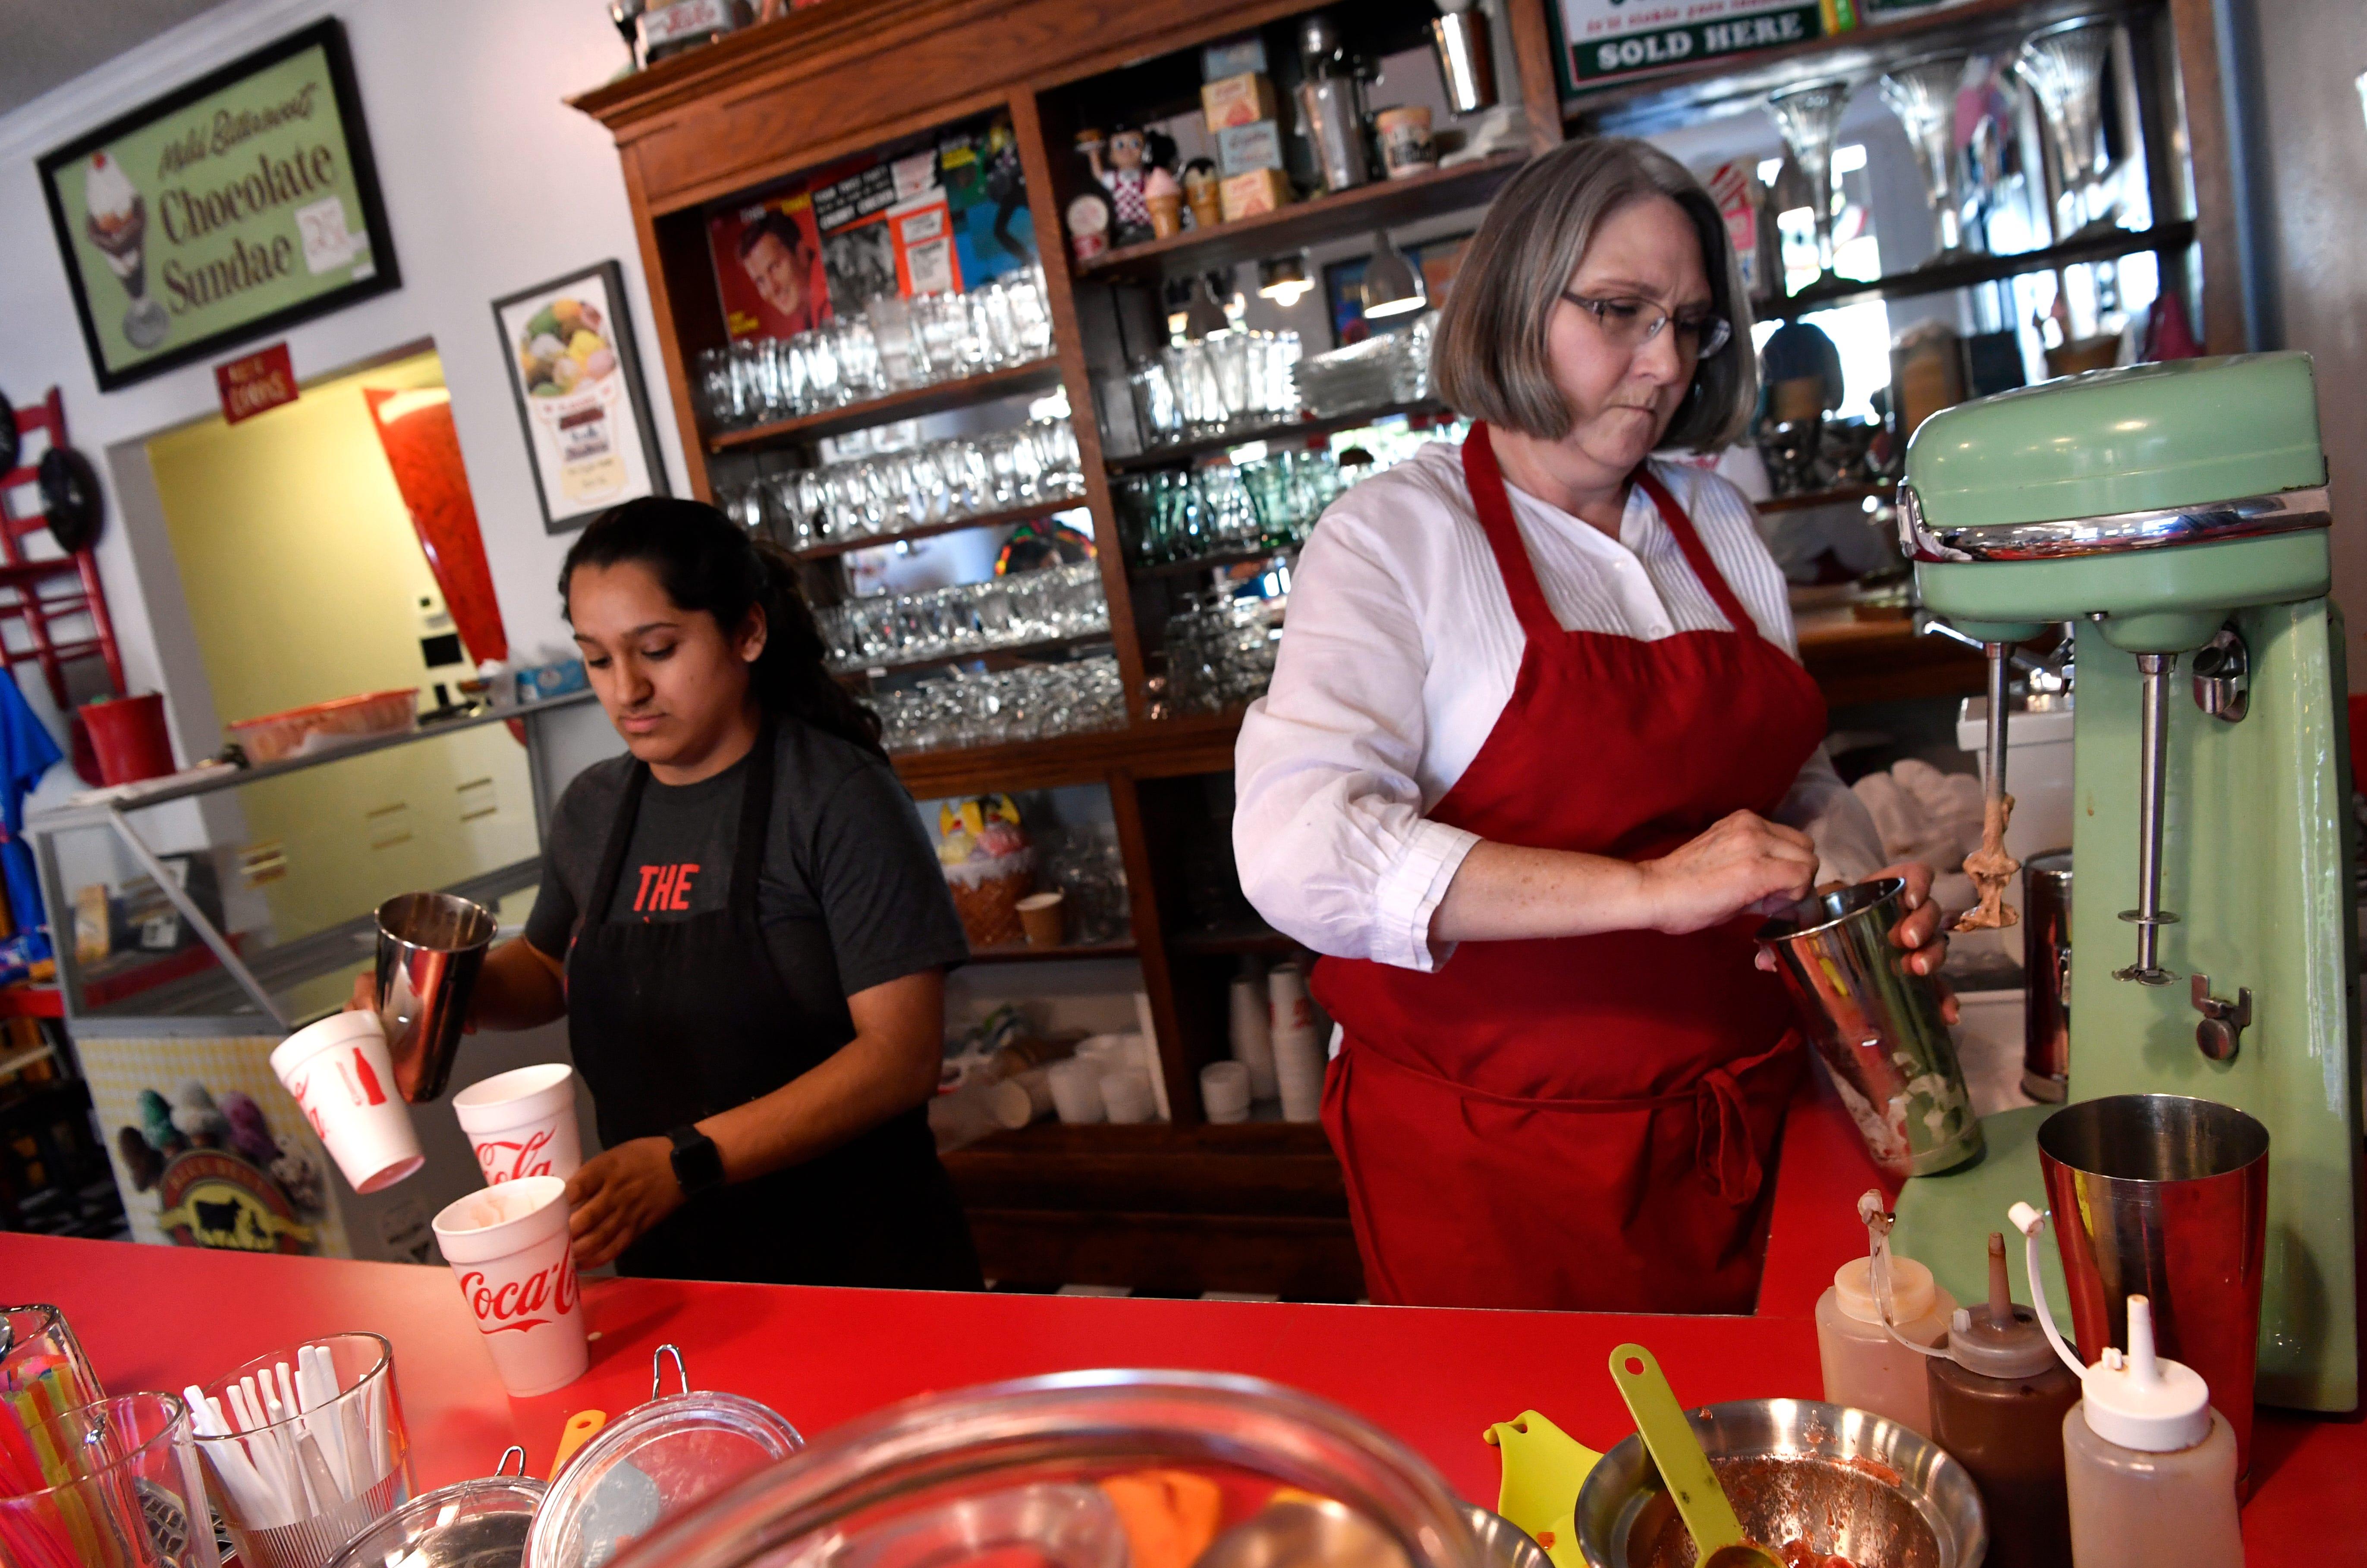 Deana Peltz (right) and Sofia Jimenez make shakes for customers Friday at the Soda Shop in Comanche. The ice cream shop is run by the non-profit Revitalize Comanche.